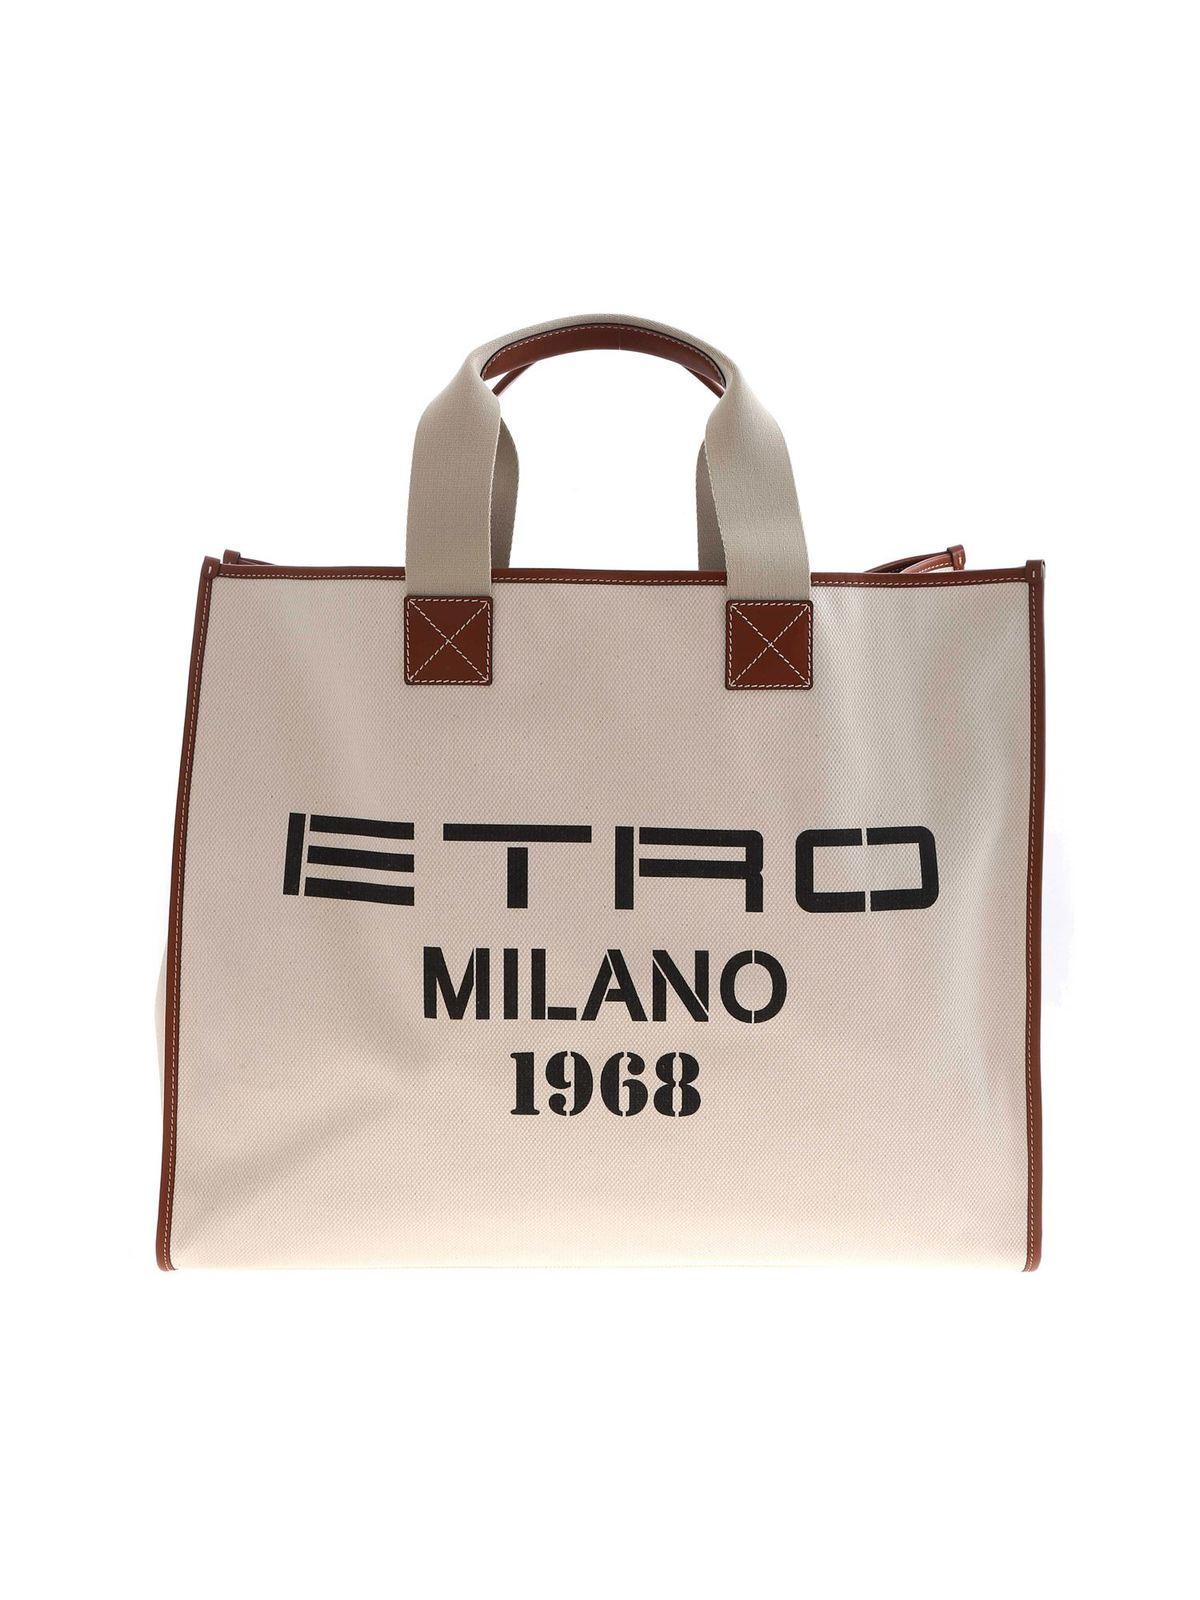 Etro Leathers MAXI LOGO PRINT HANDBAG IN BEIGE